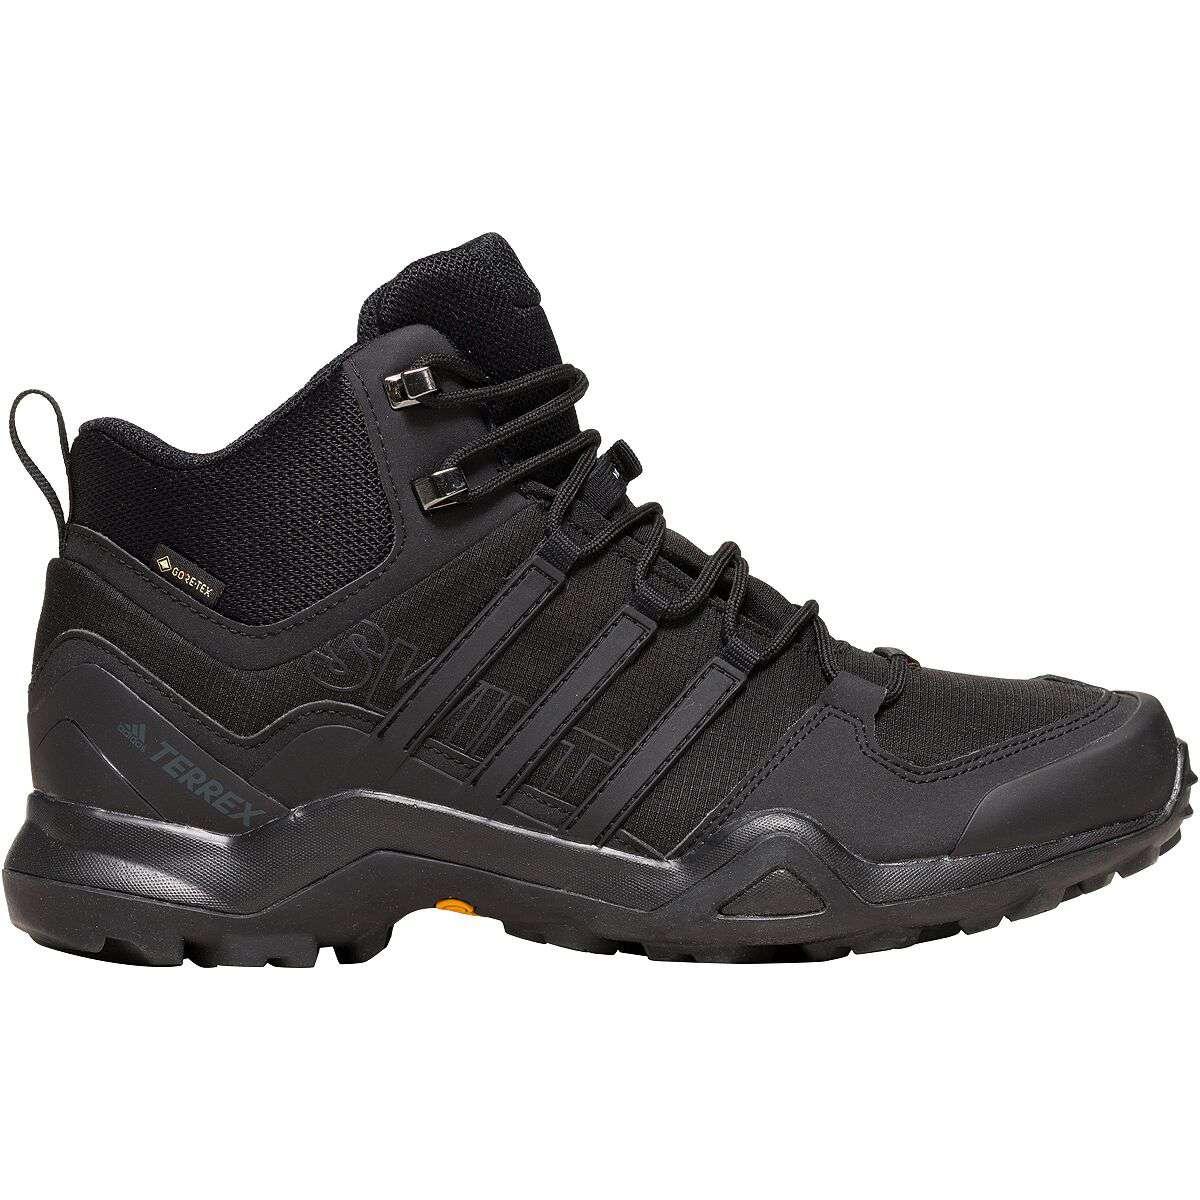 Adidas OutdoorTerrex Swift R2 Mid GTX Hiking Shoe